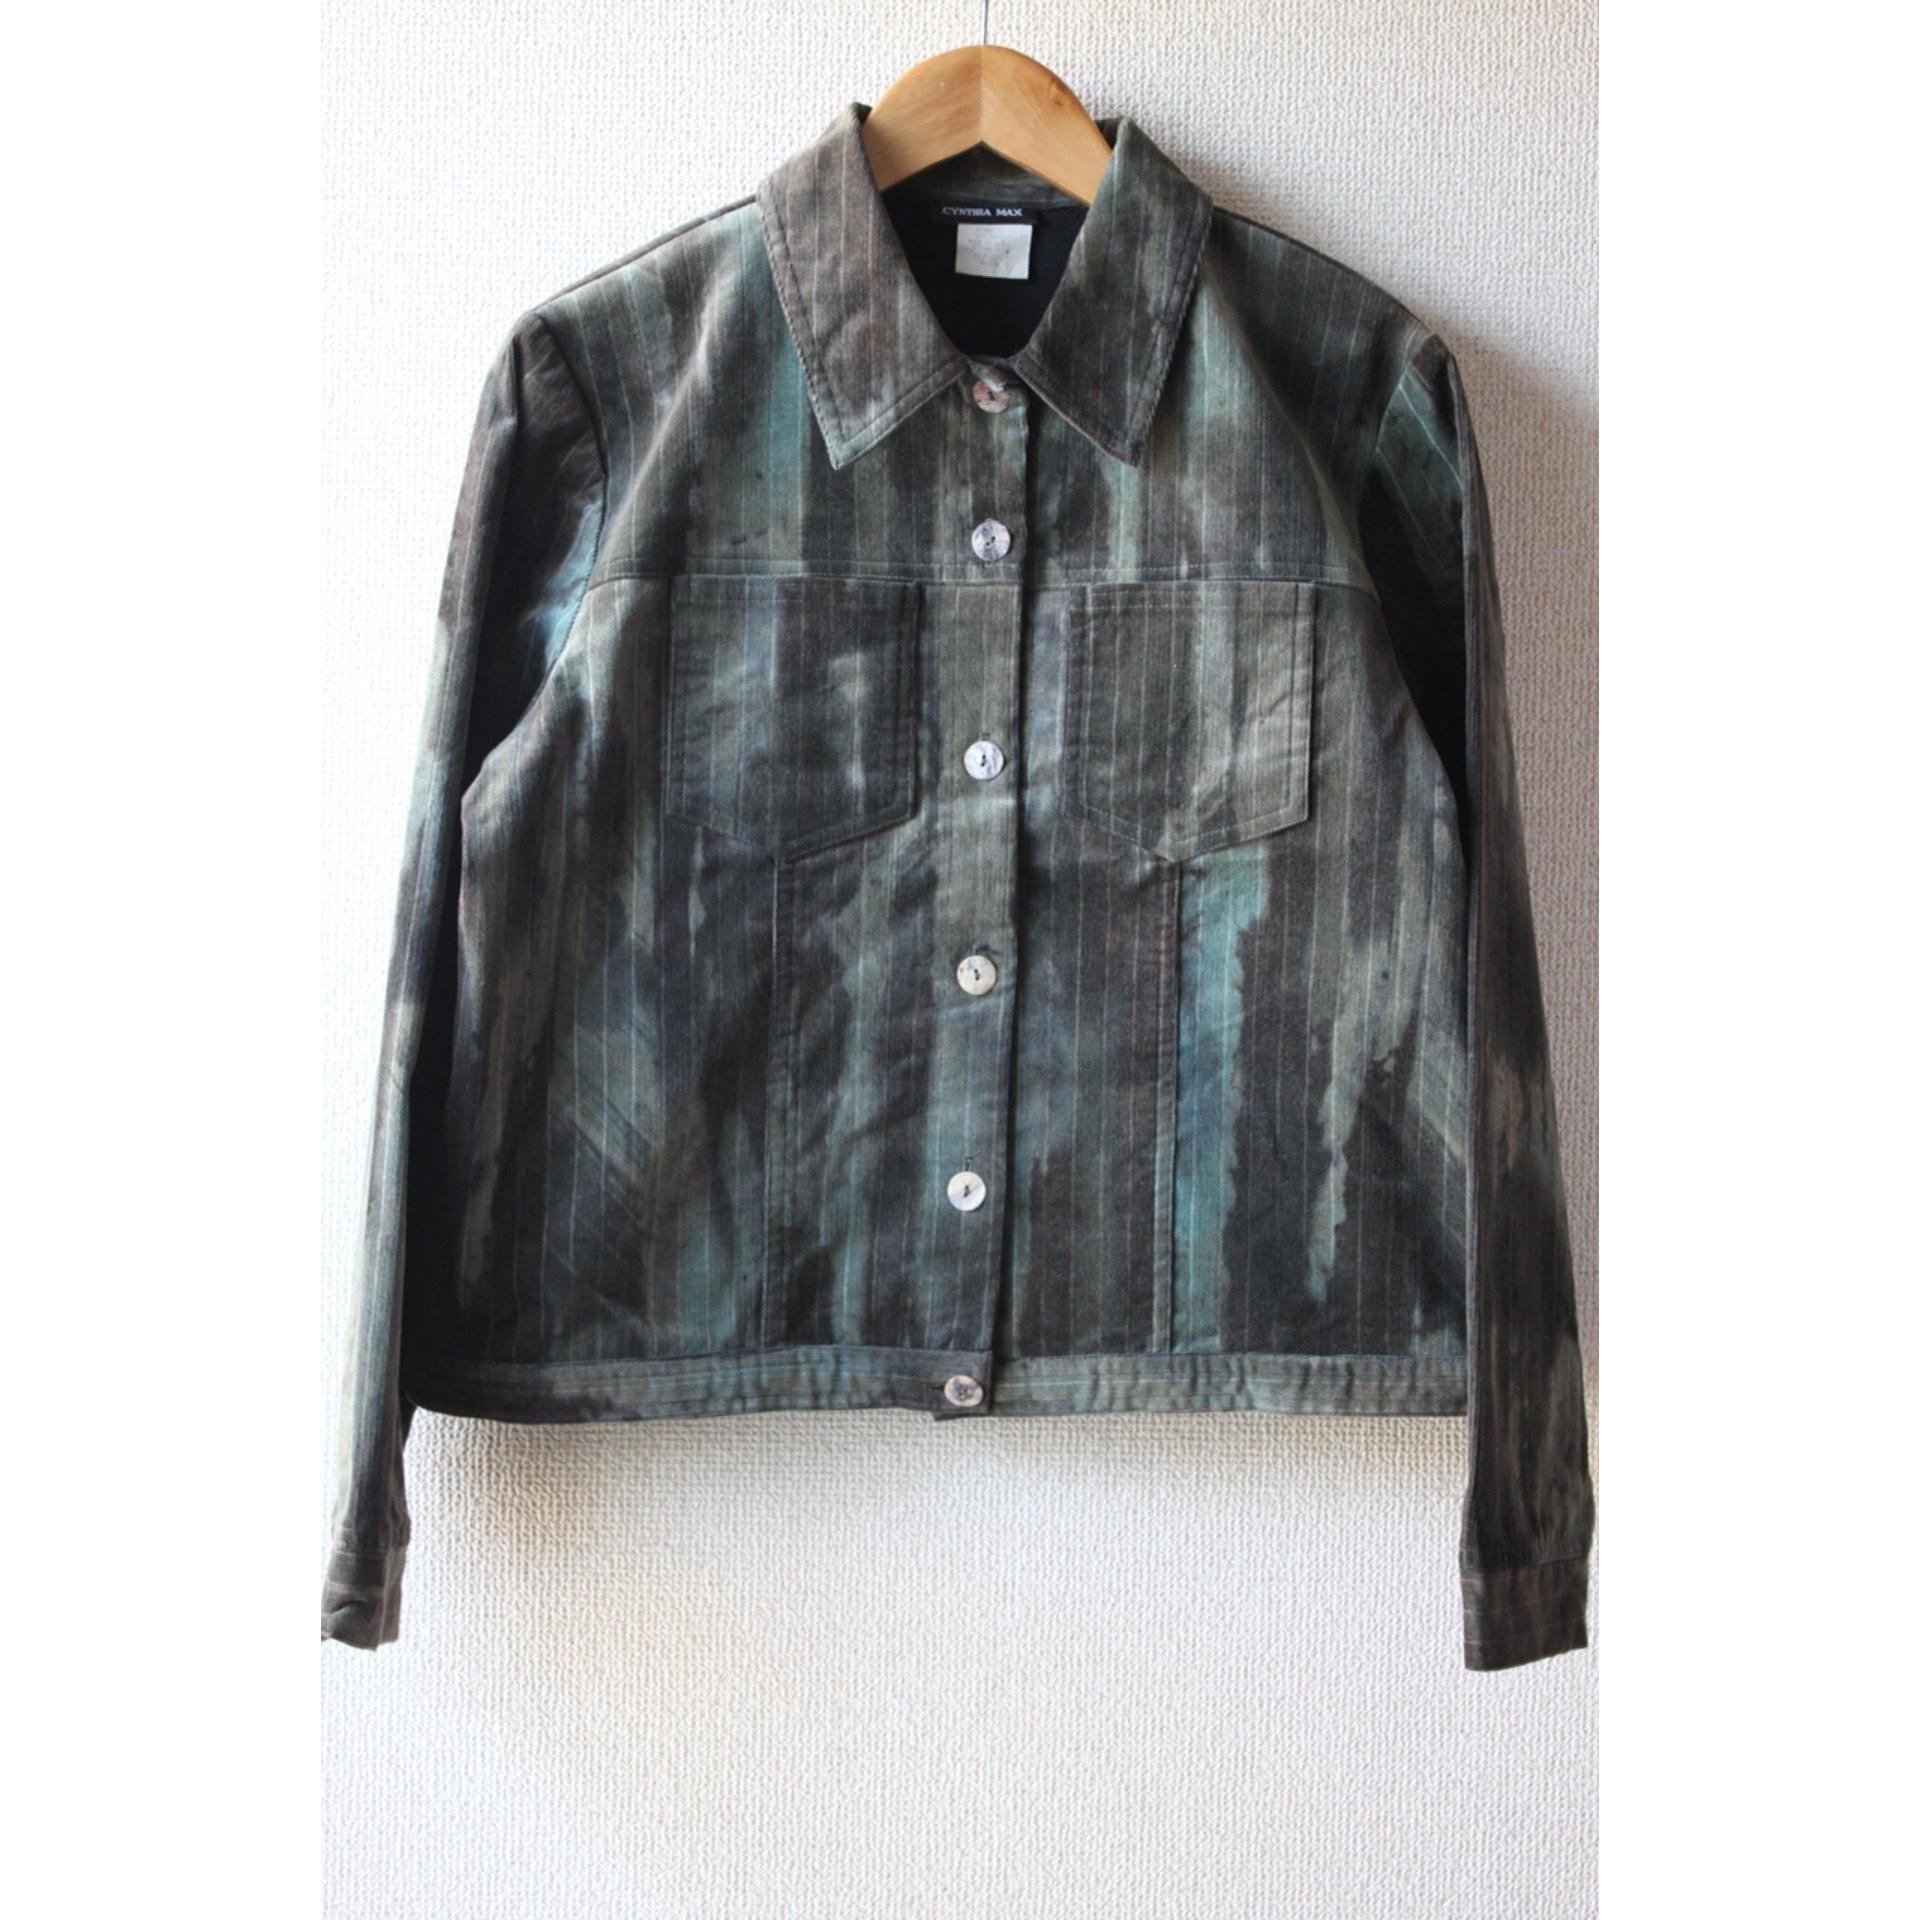 Vintage blurred print jacket